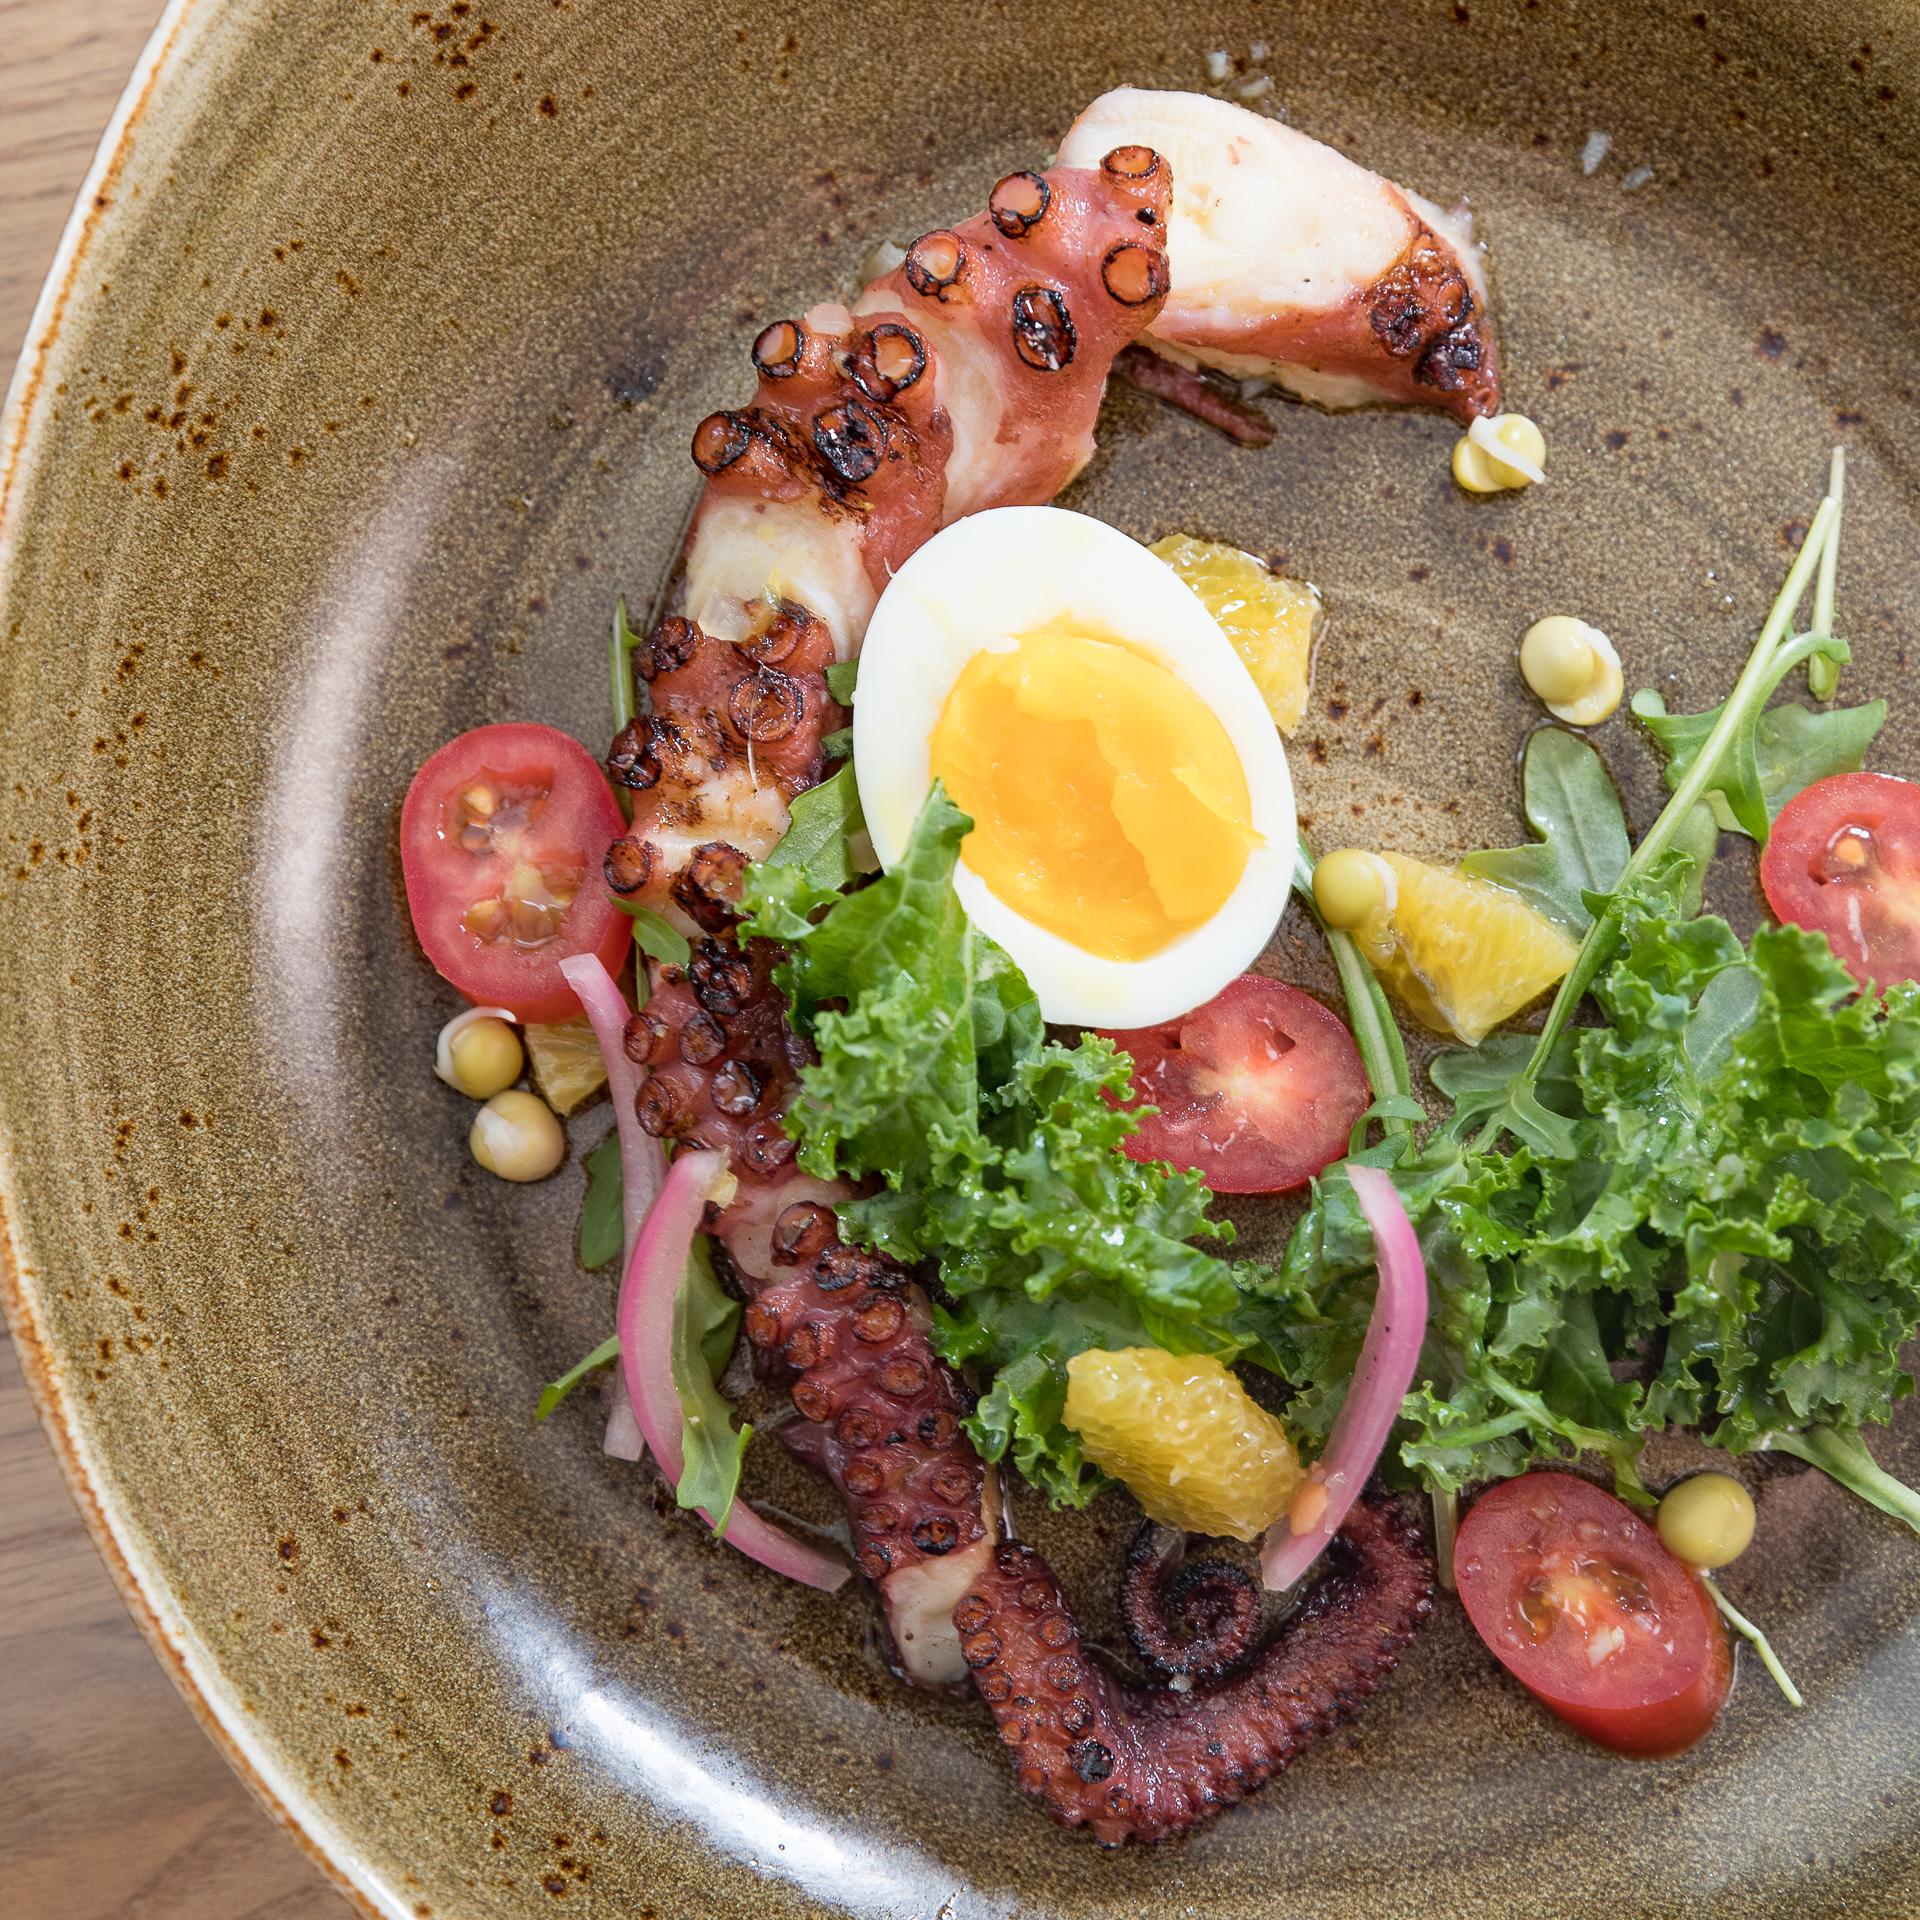 Roy's Hawaii_Grilled He'e (Tako), Kale, Arugula, Pickled Pea, Adzuki, and Lentil sprouts, Orange and Tomato Dressing, 3 Minute Egg__pc Craig Bixel_20170125-02.jpg